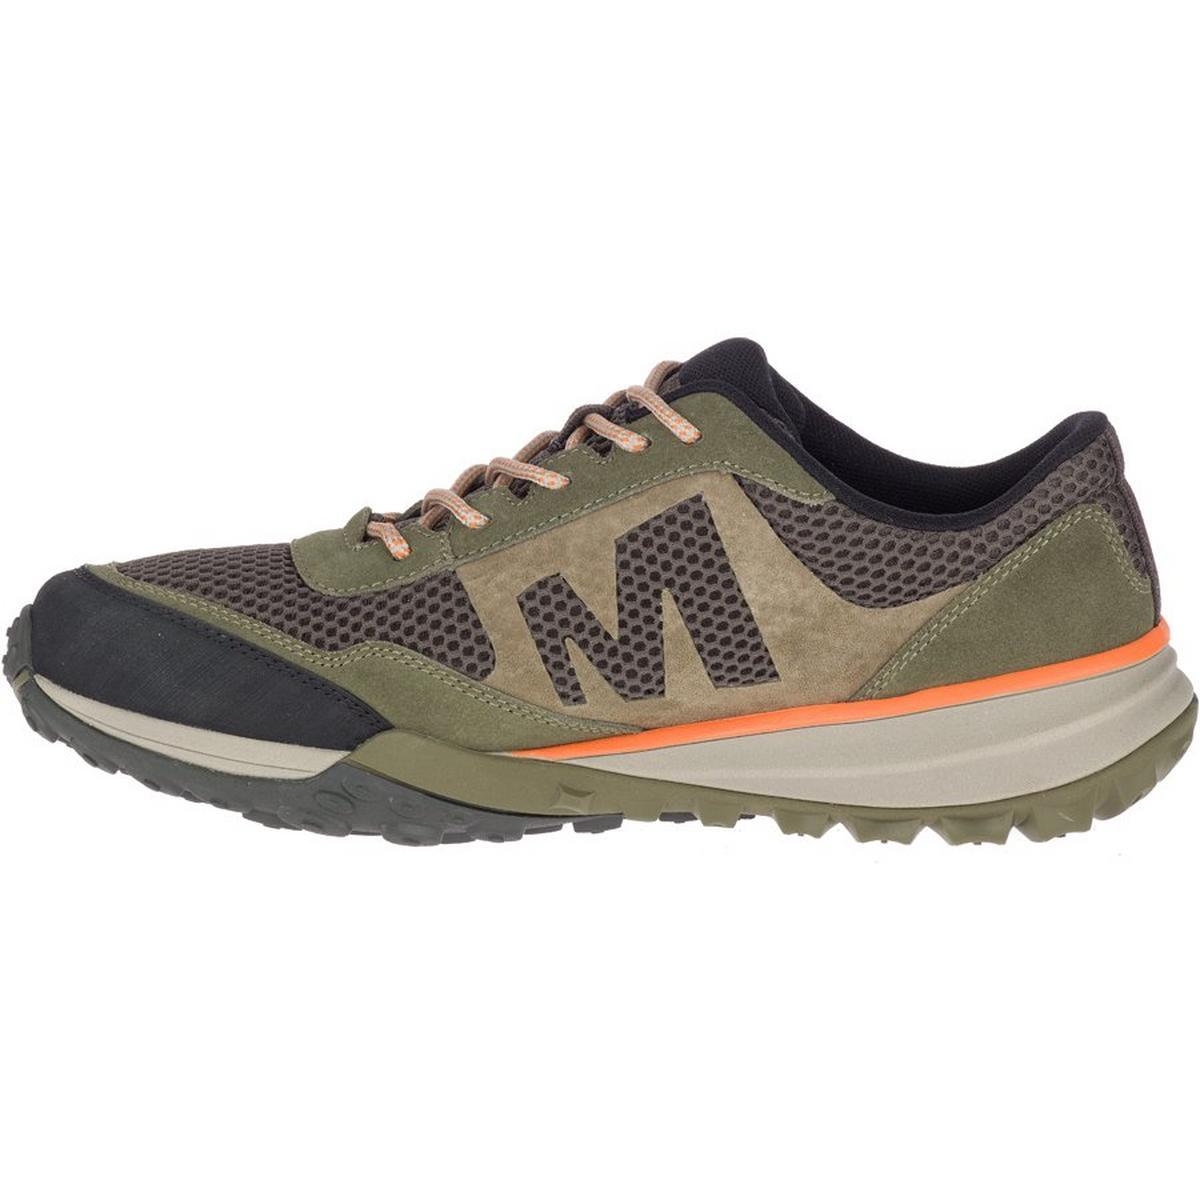 Merrell Men's Havoc Vent Approach Shoe